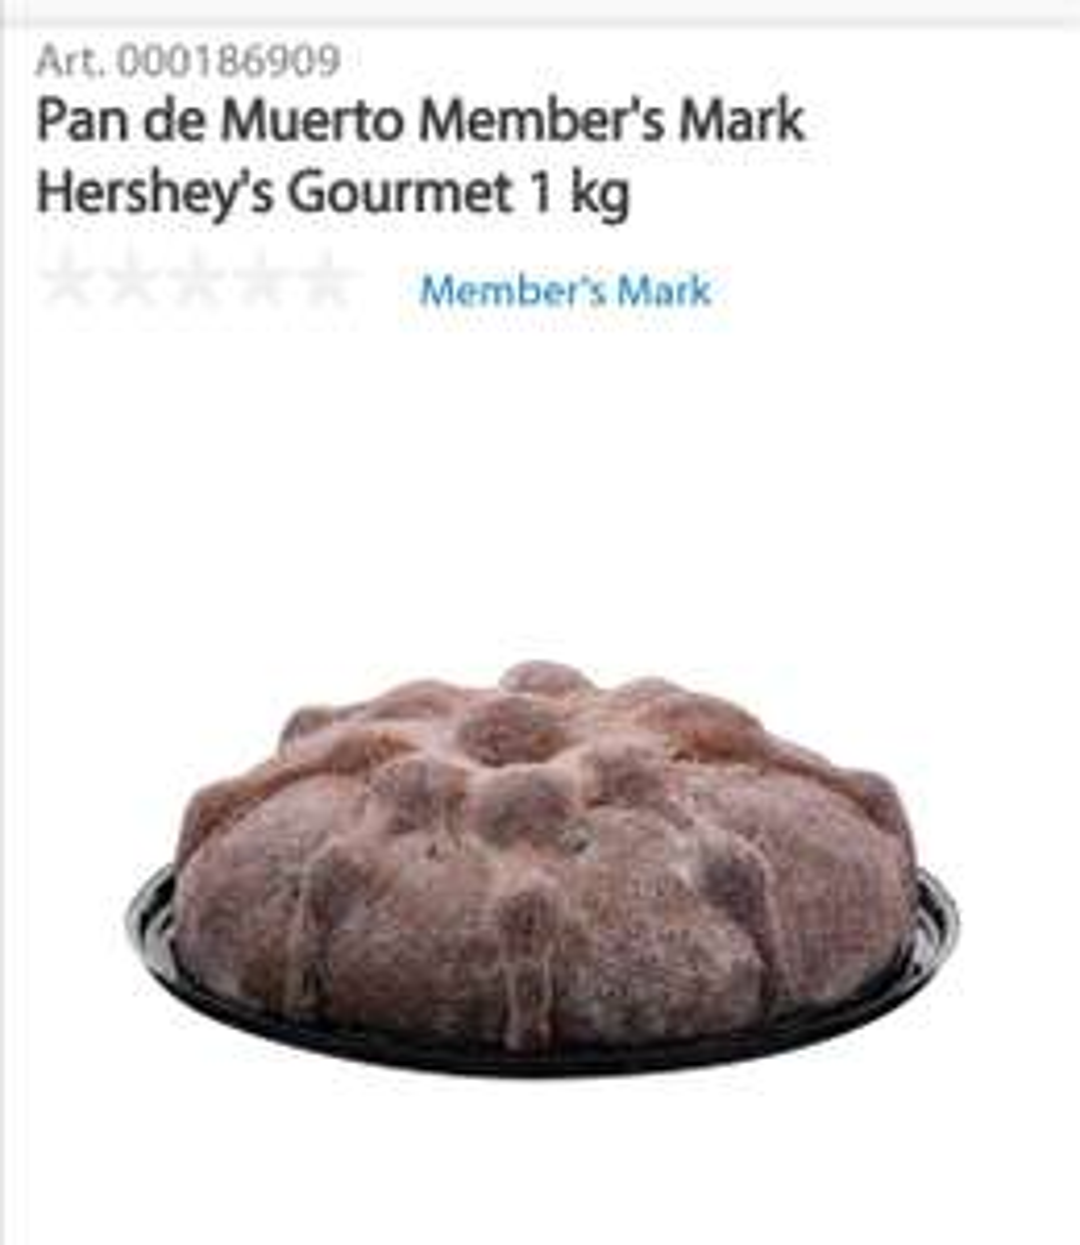 Sam's Club Pan de muerto Hershey's Gourmet 1 kg